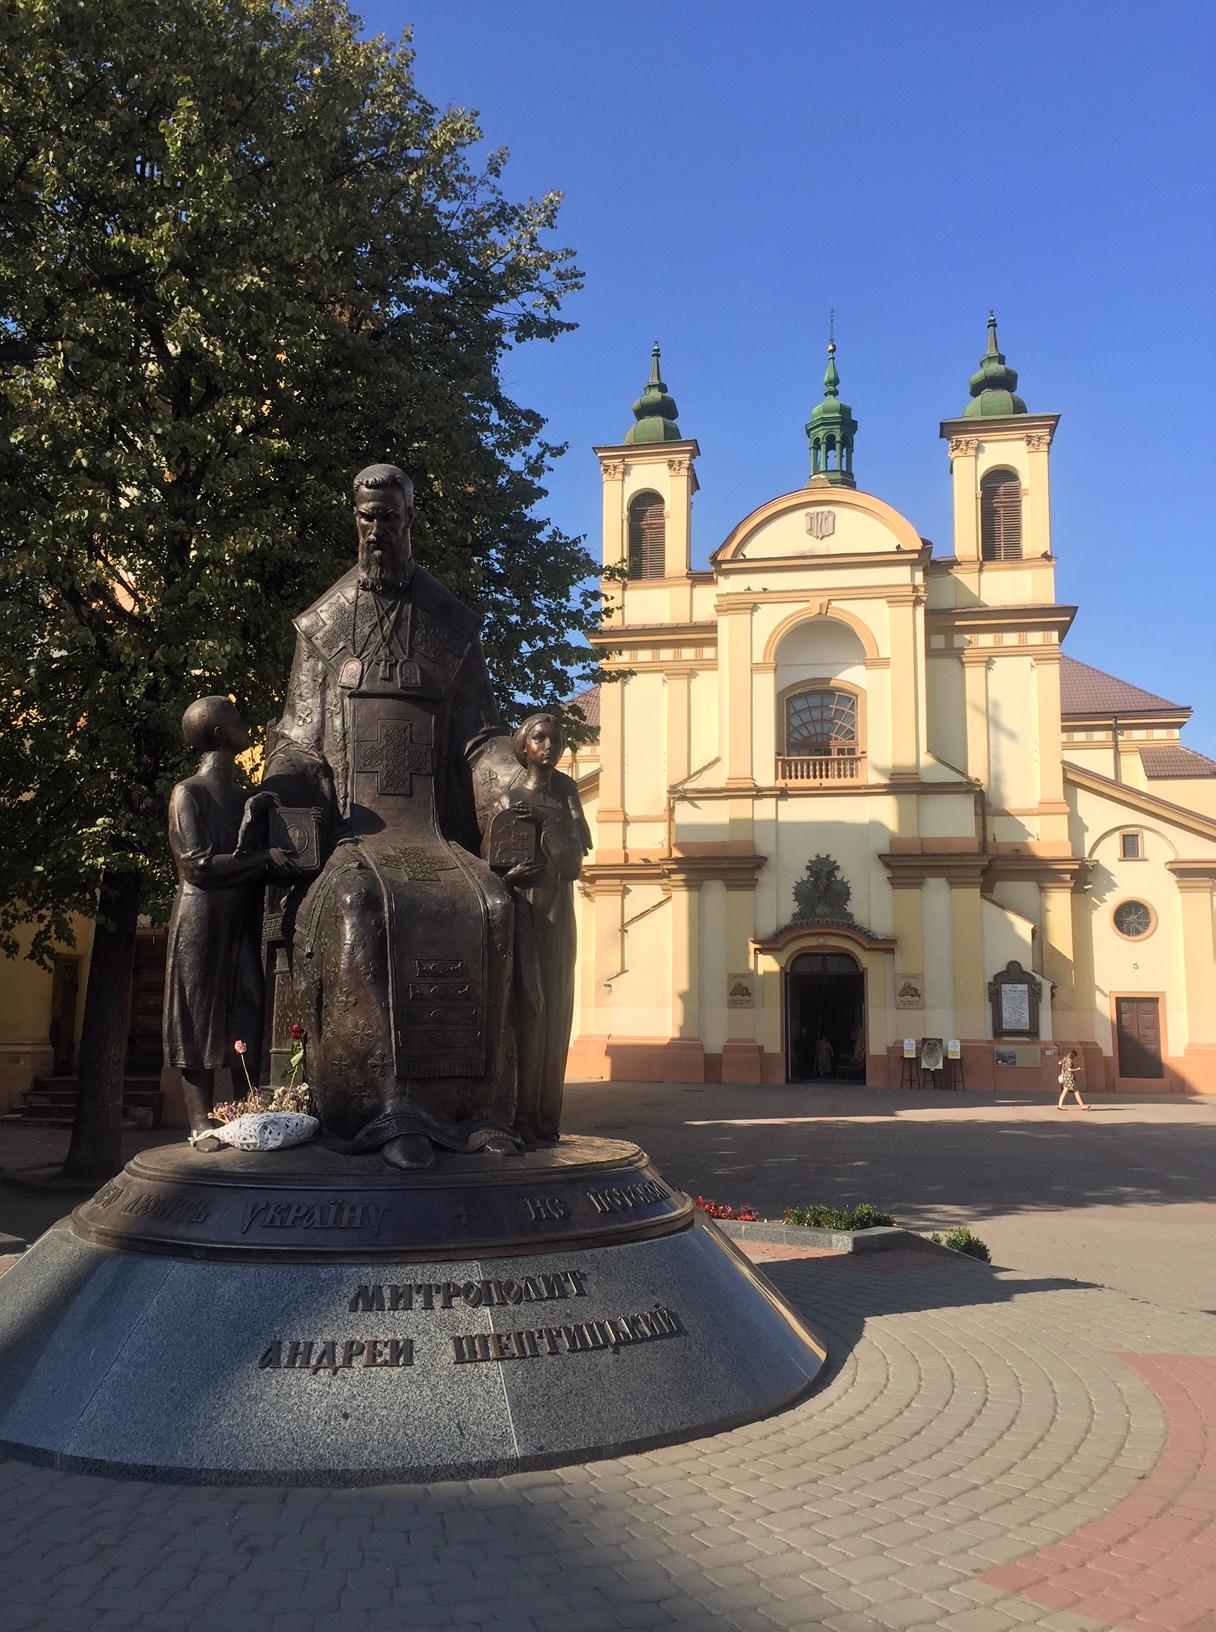 Sheptytsky Square Ivano-Frankivsk